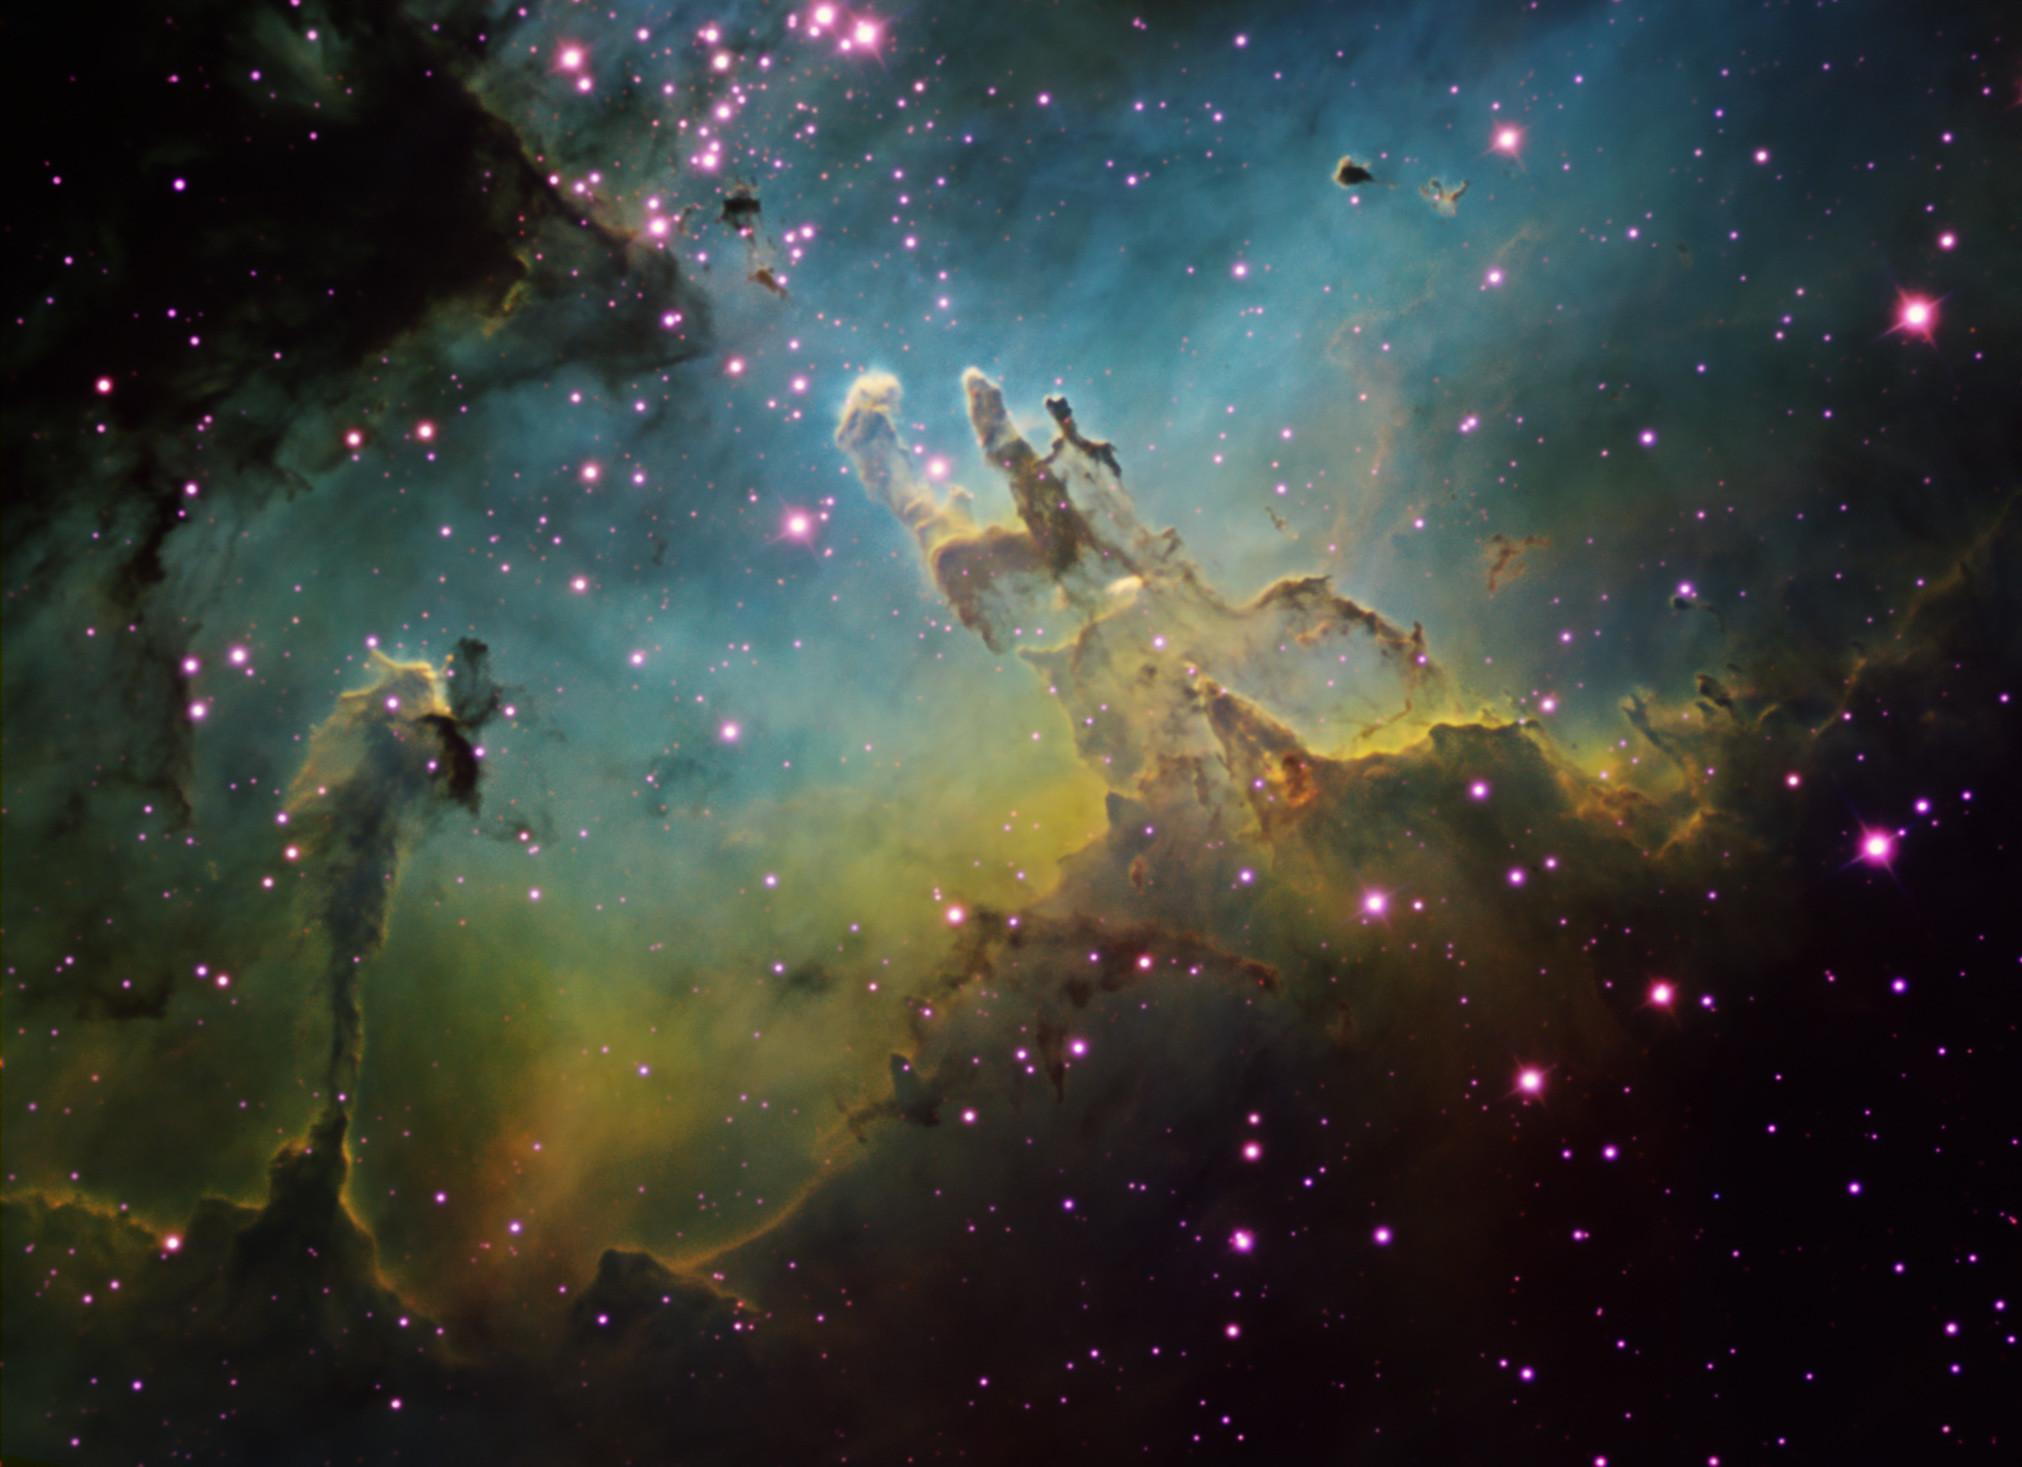 Hubble Images Super High Resolution Hubble Images H...